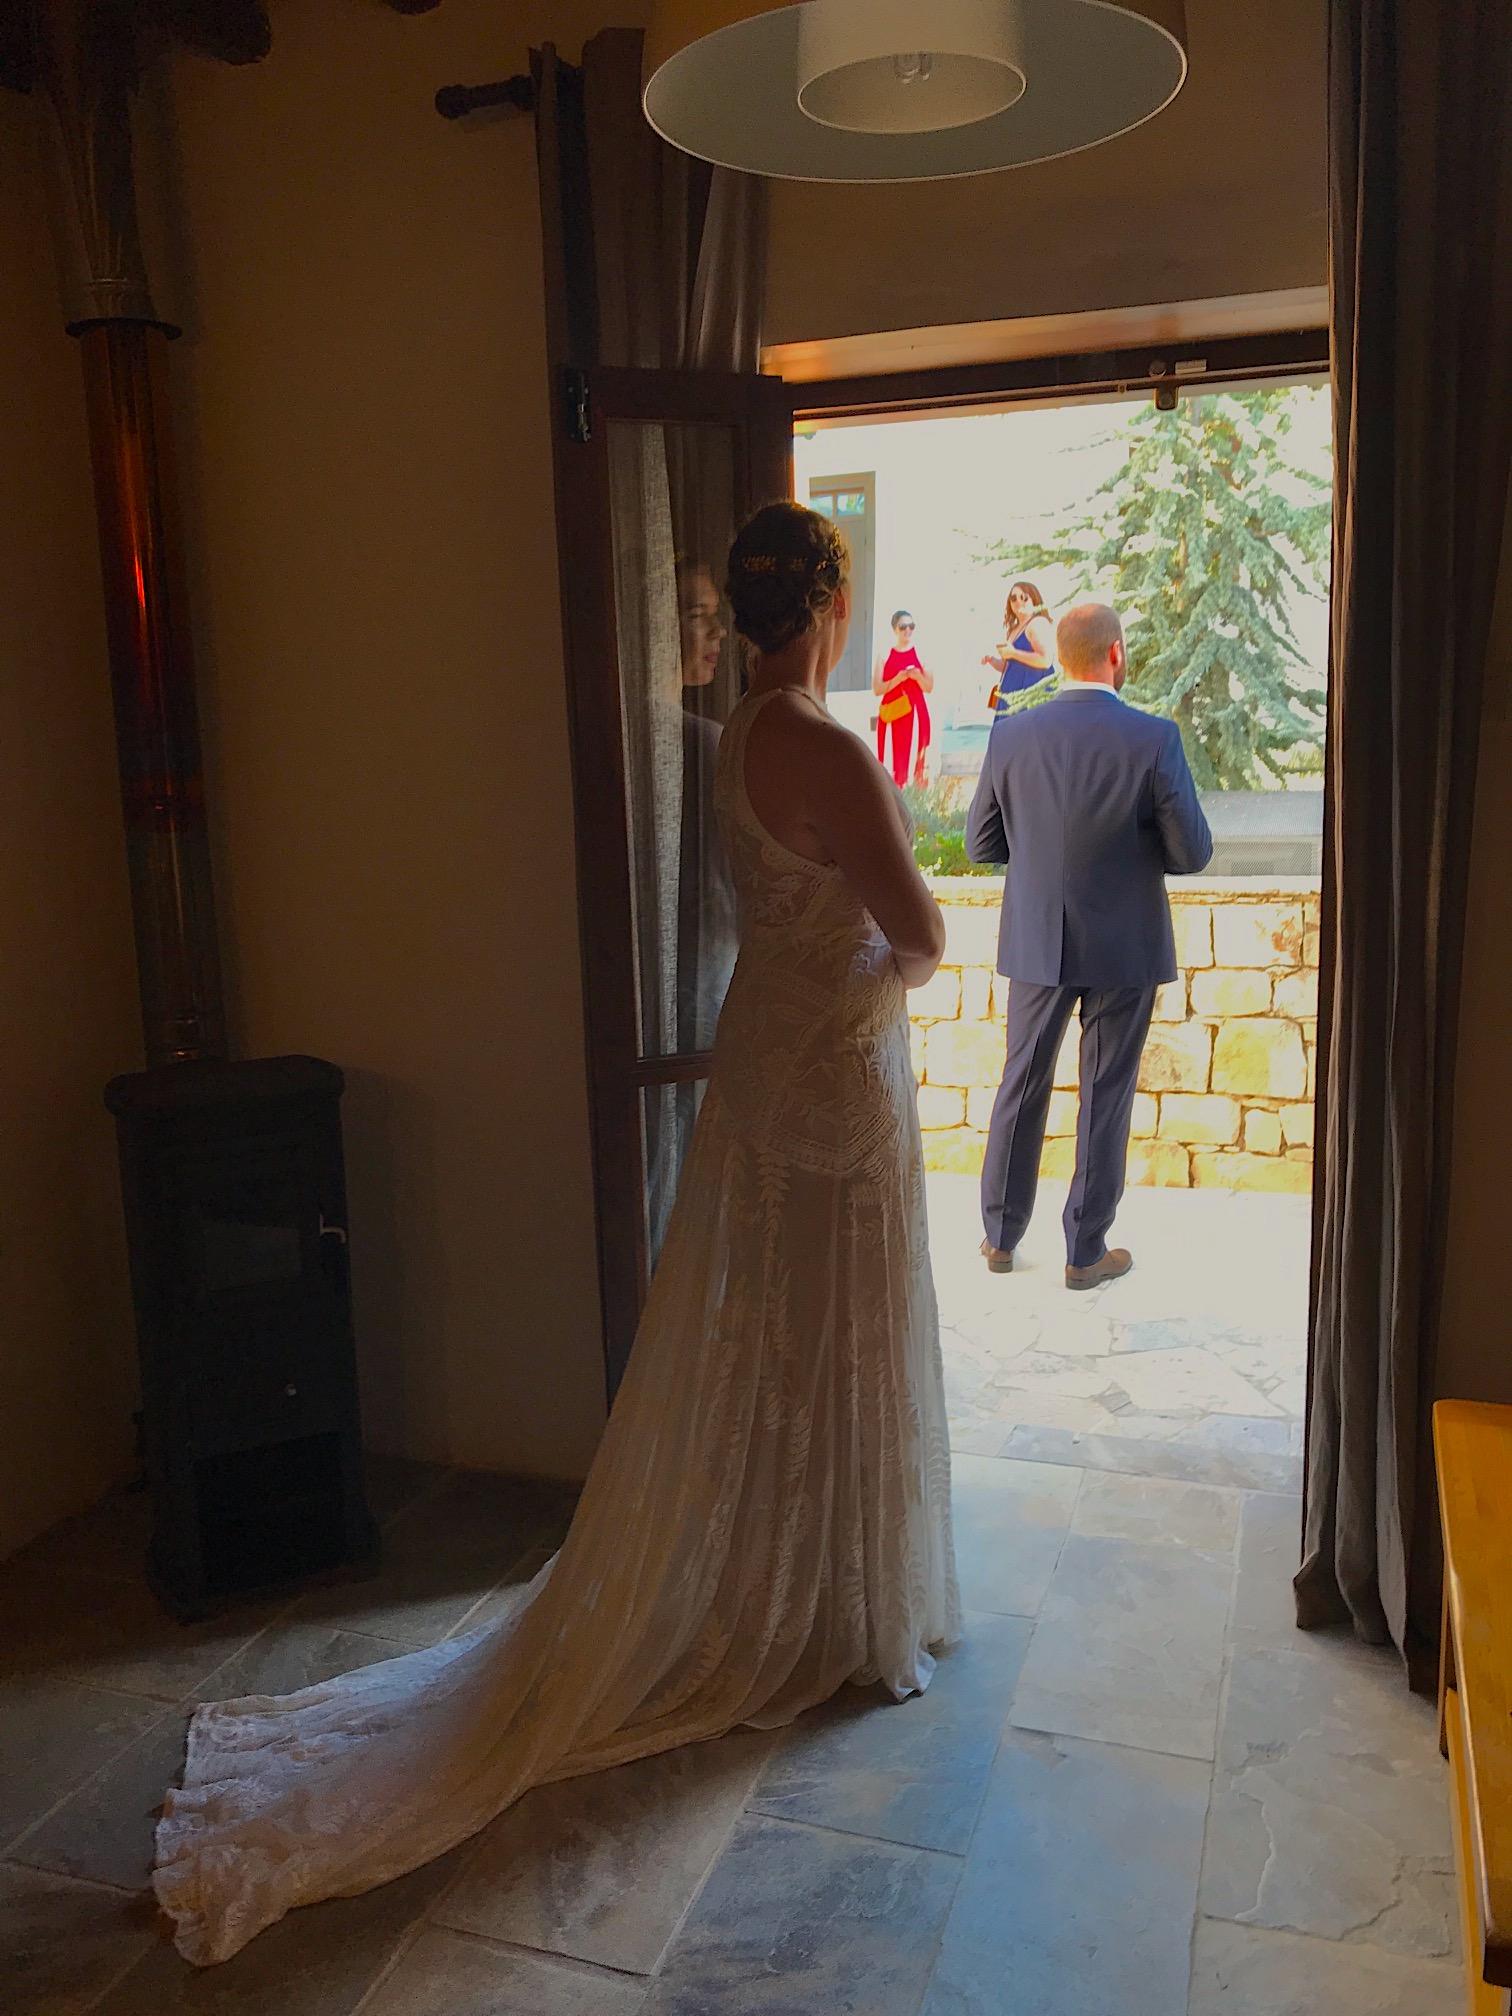 kelli before the wedding